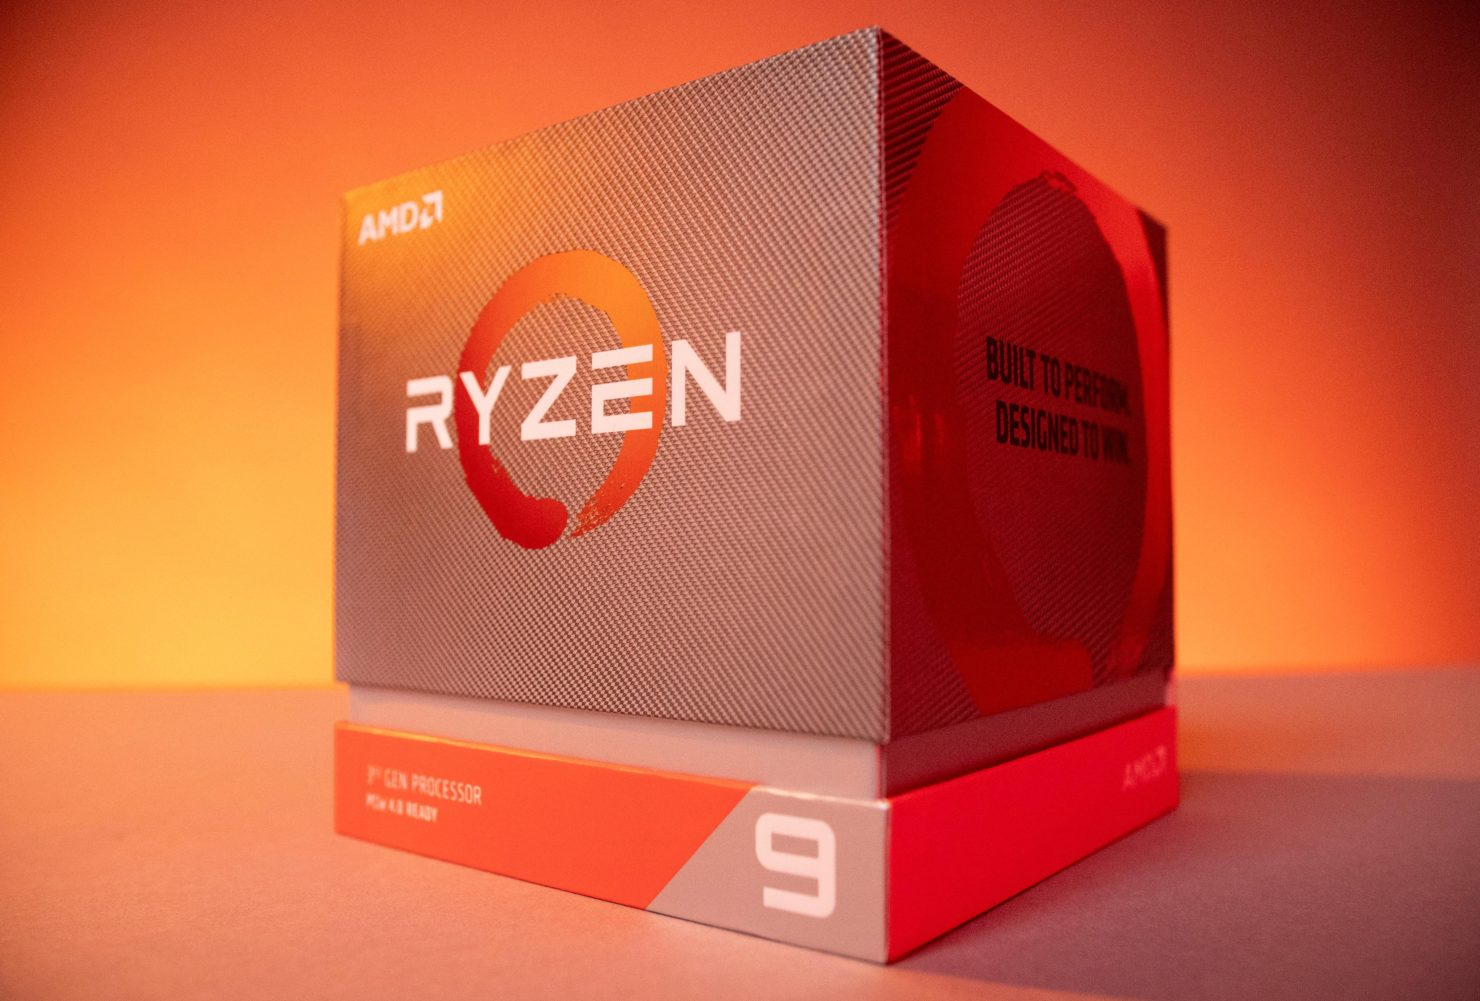 amd-ryzen-9-3900xt-12-core-&-ryzen-5-3600xt-6-core-matisse-refresh-desktop-cpus-listed,-retail-launch-on-7th-july